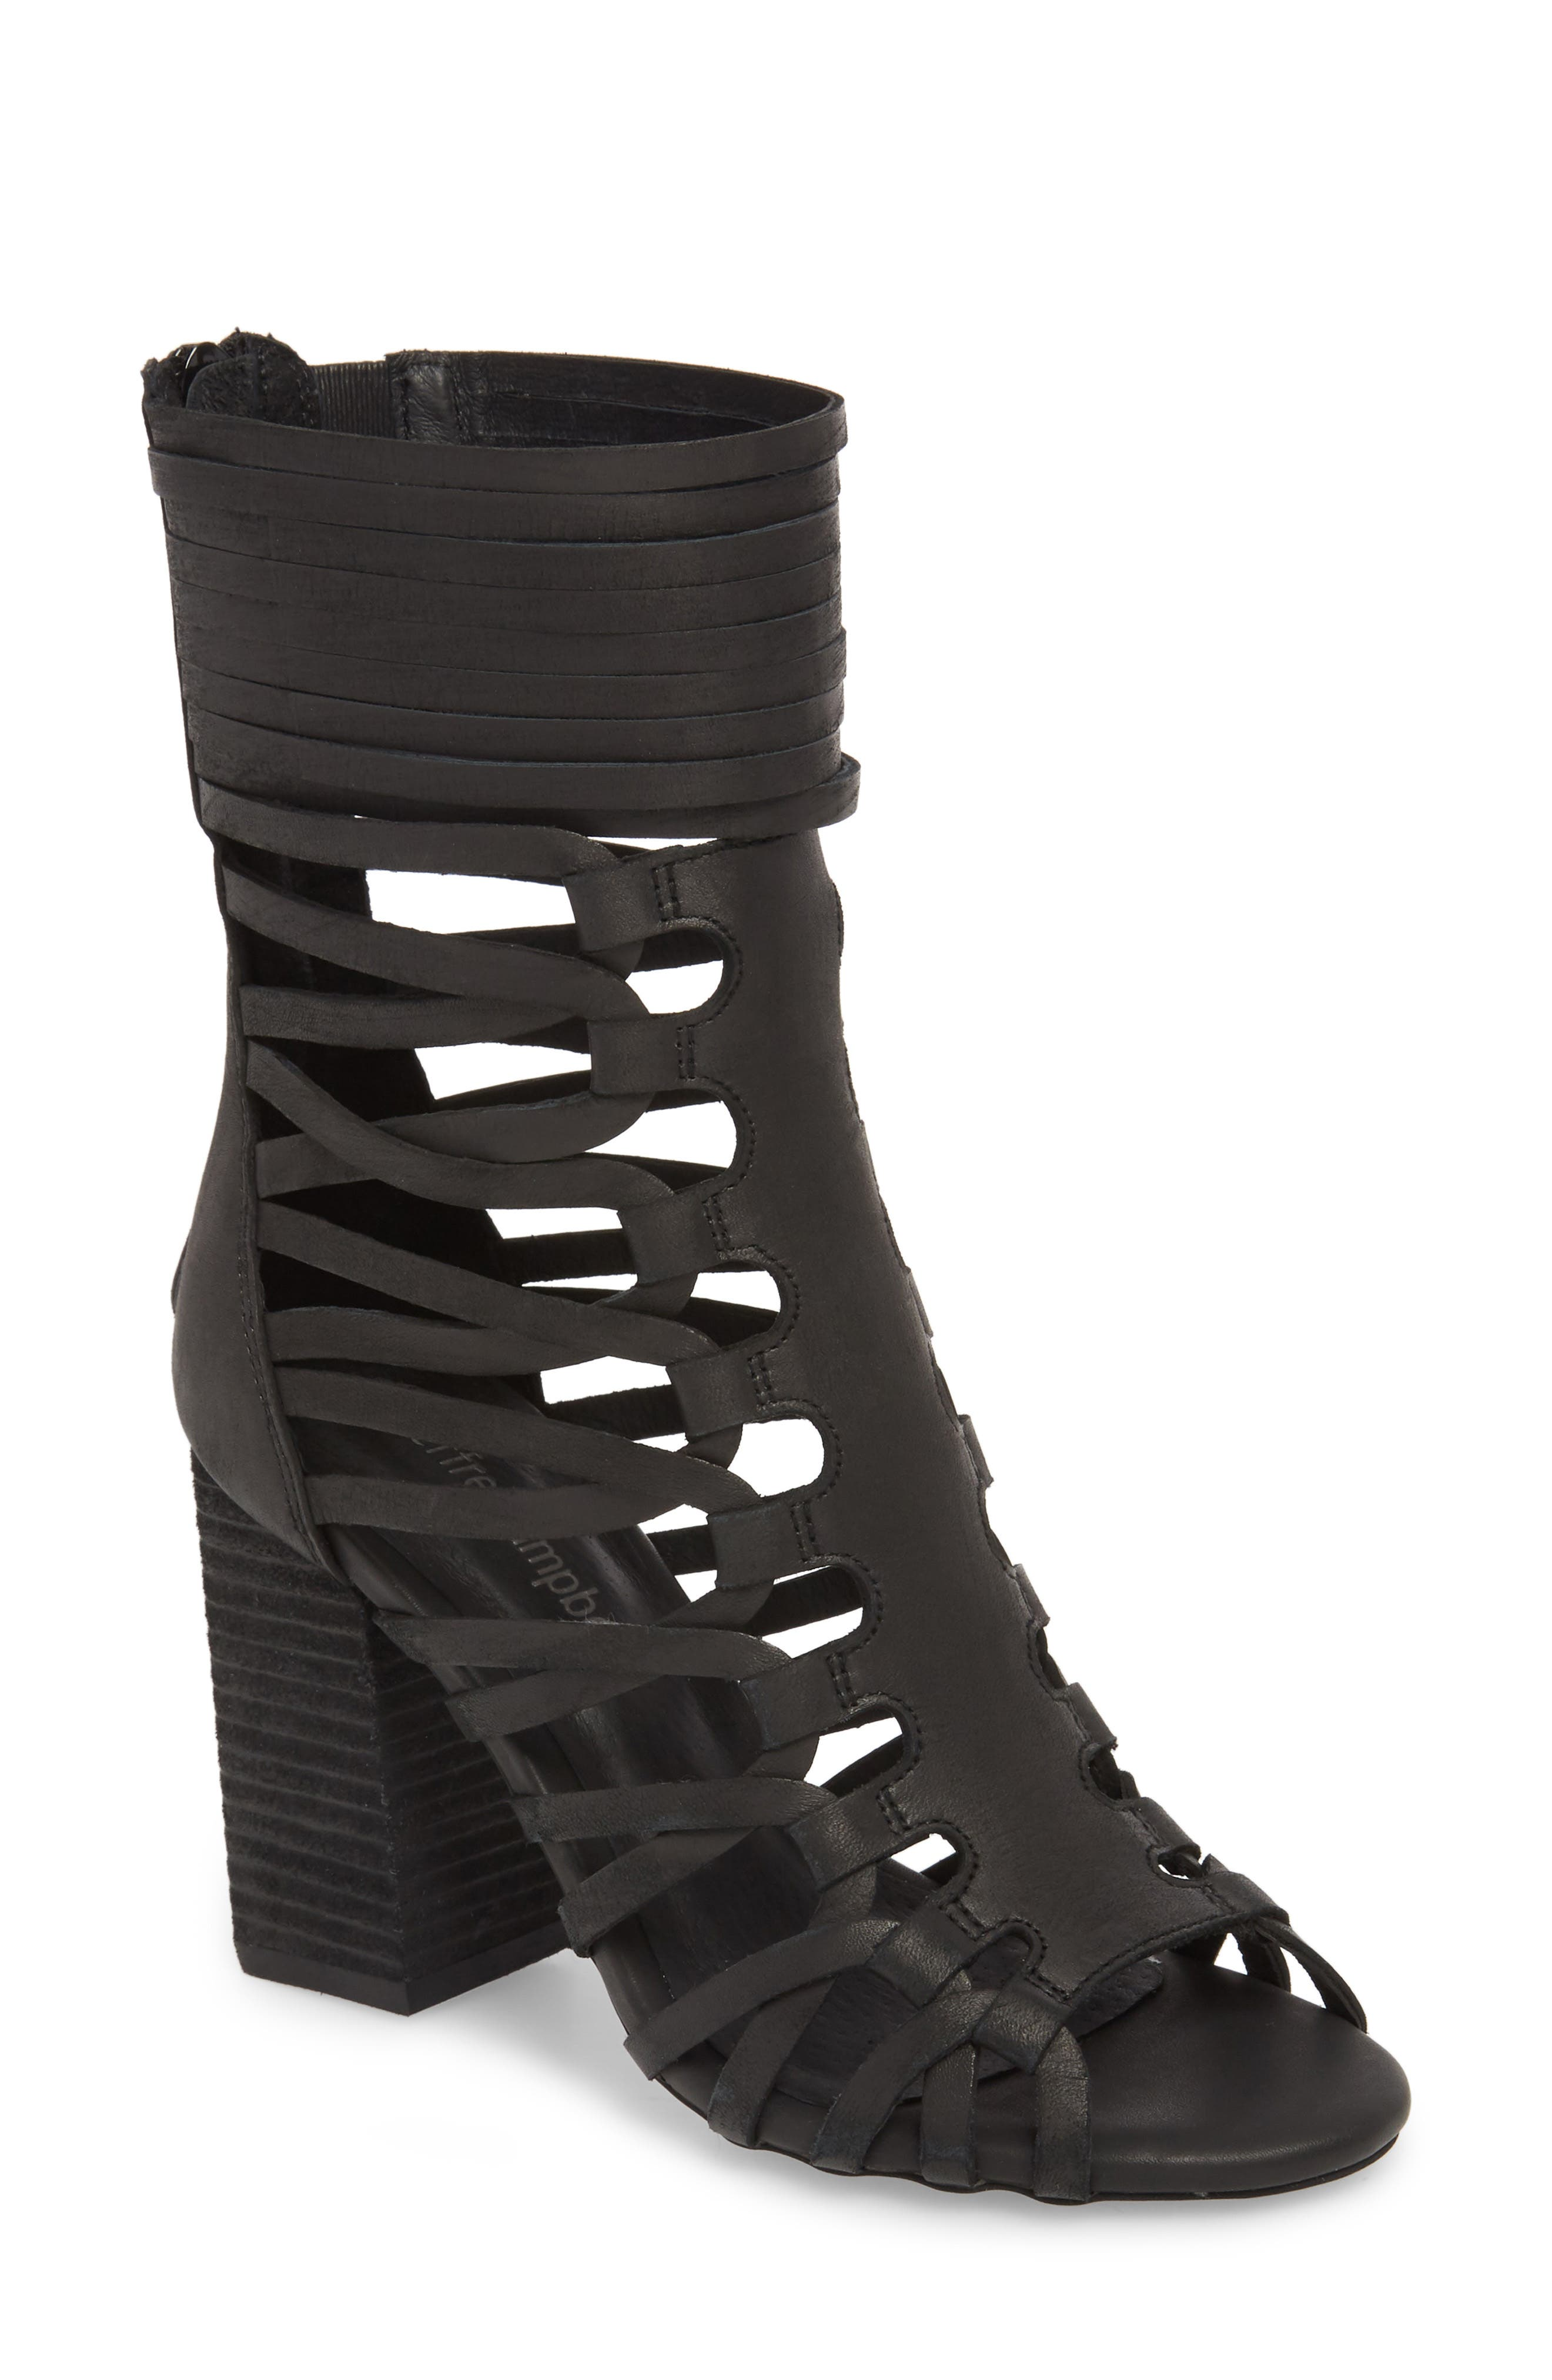 Despacito Bootie,                         Main,                         color, Black Distressed Leather